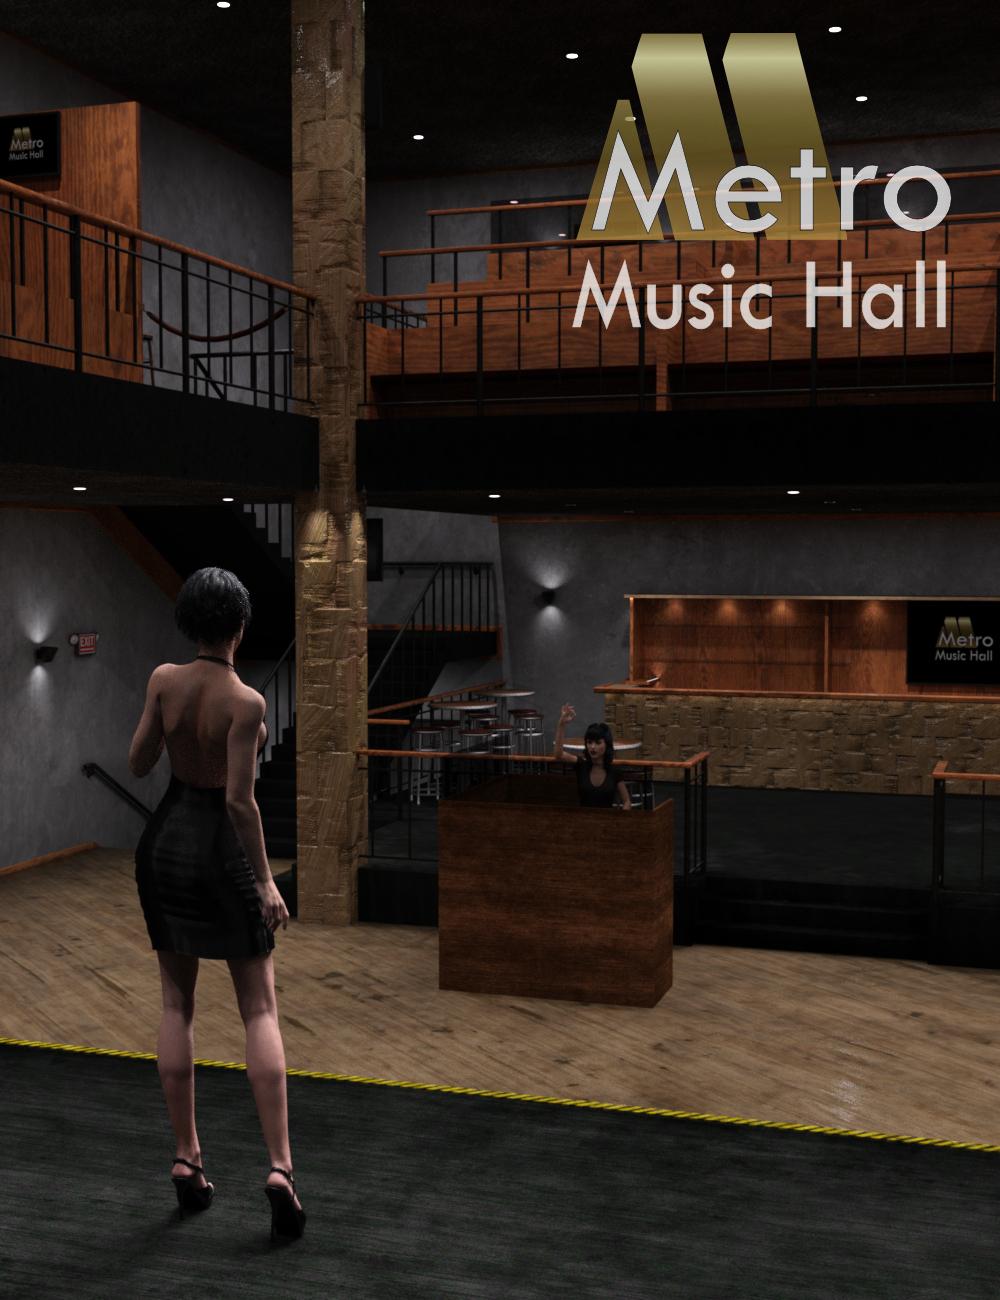 IDG Metro Music Hall by: IDG DesignsDestinysGardenInaneGlory, 3D Models by Daz 3D